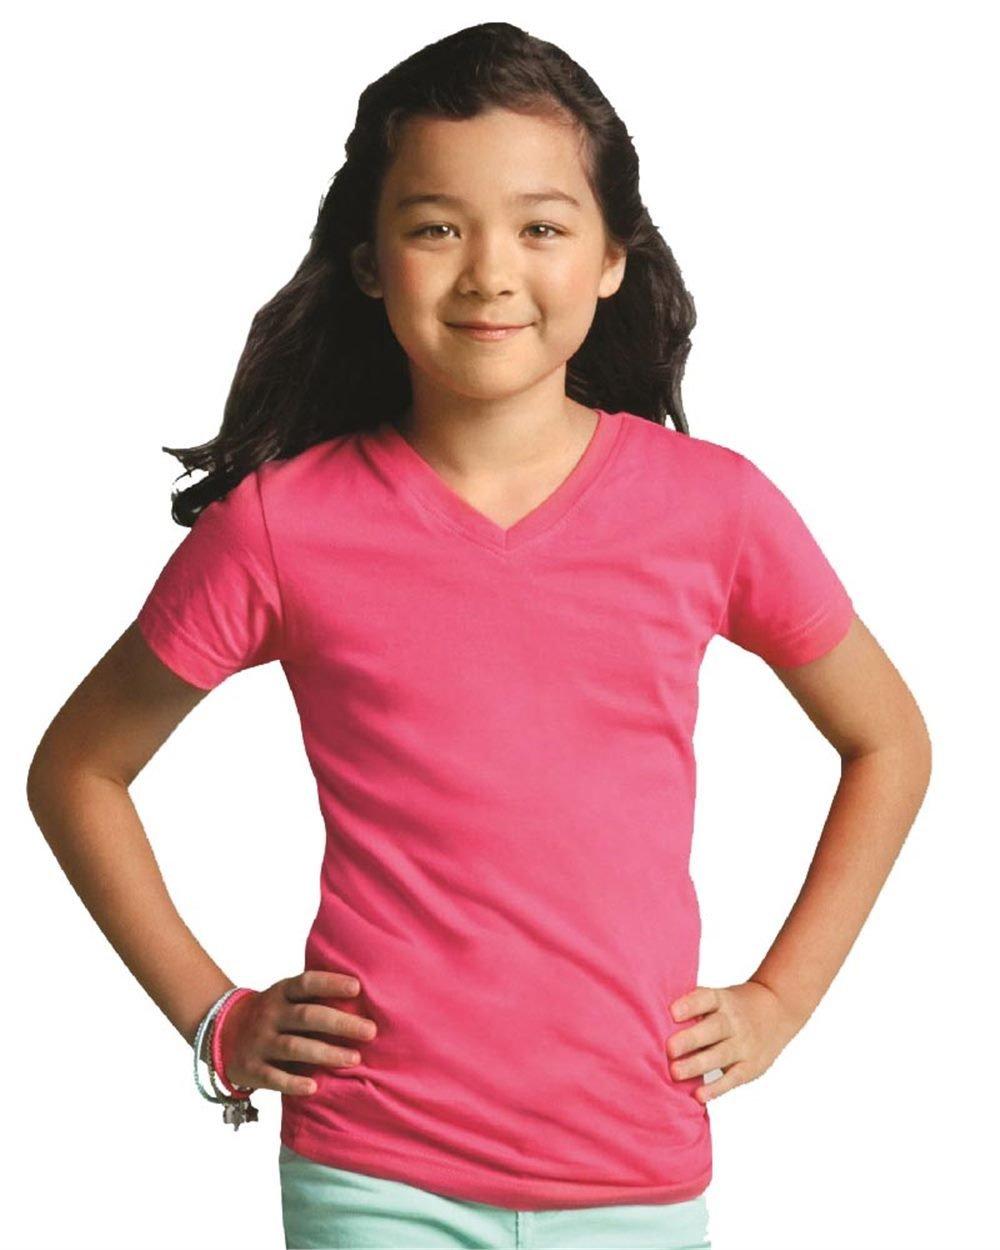 Girl's V-Neck Jersey Tee - (STYLE#STLT002607)